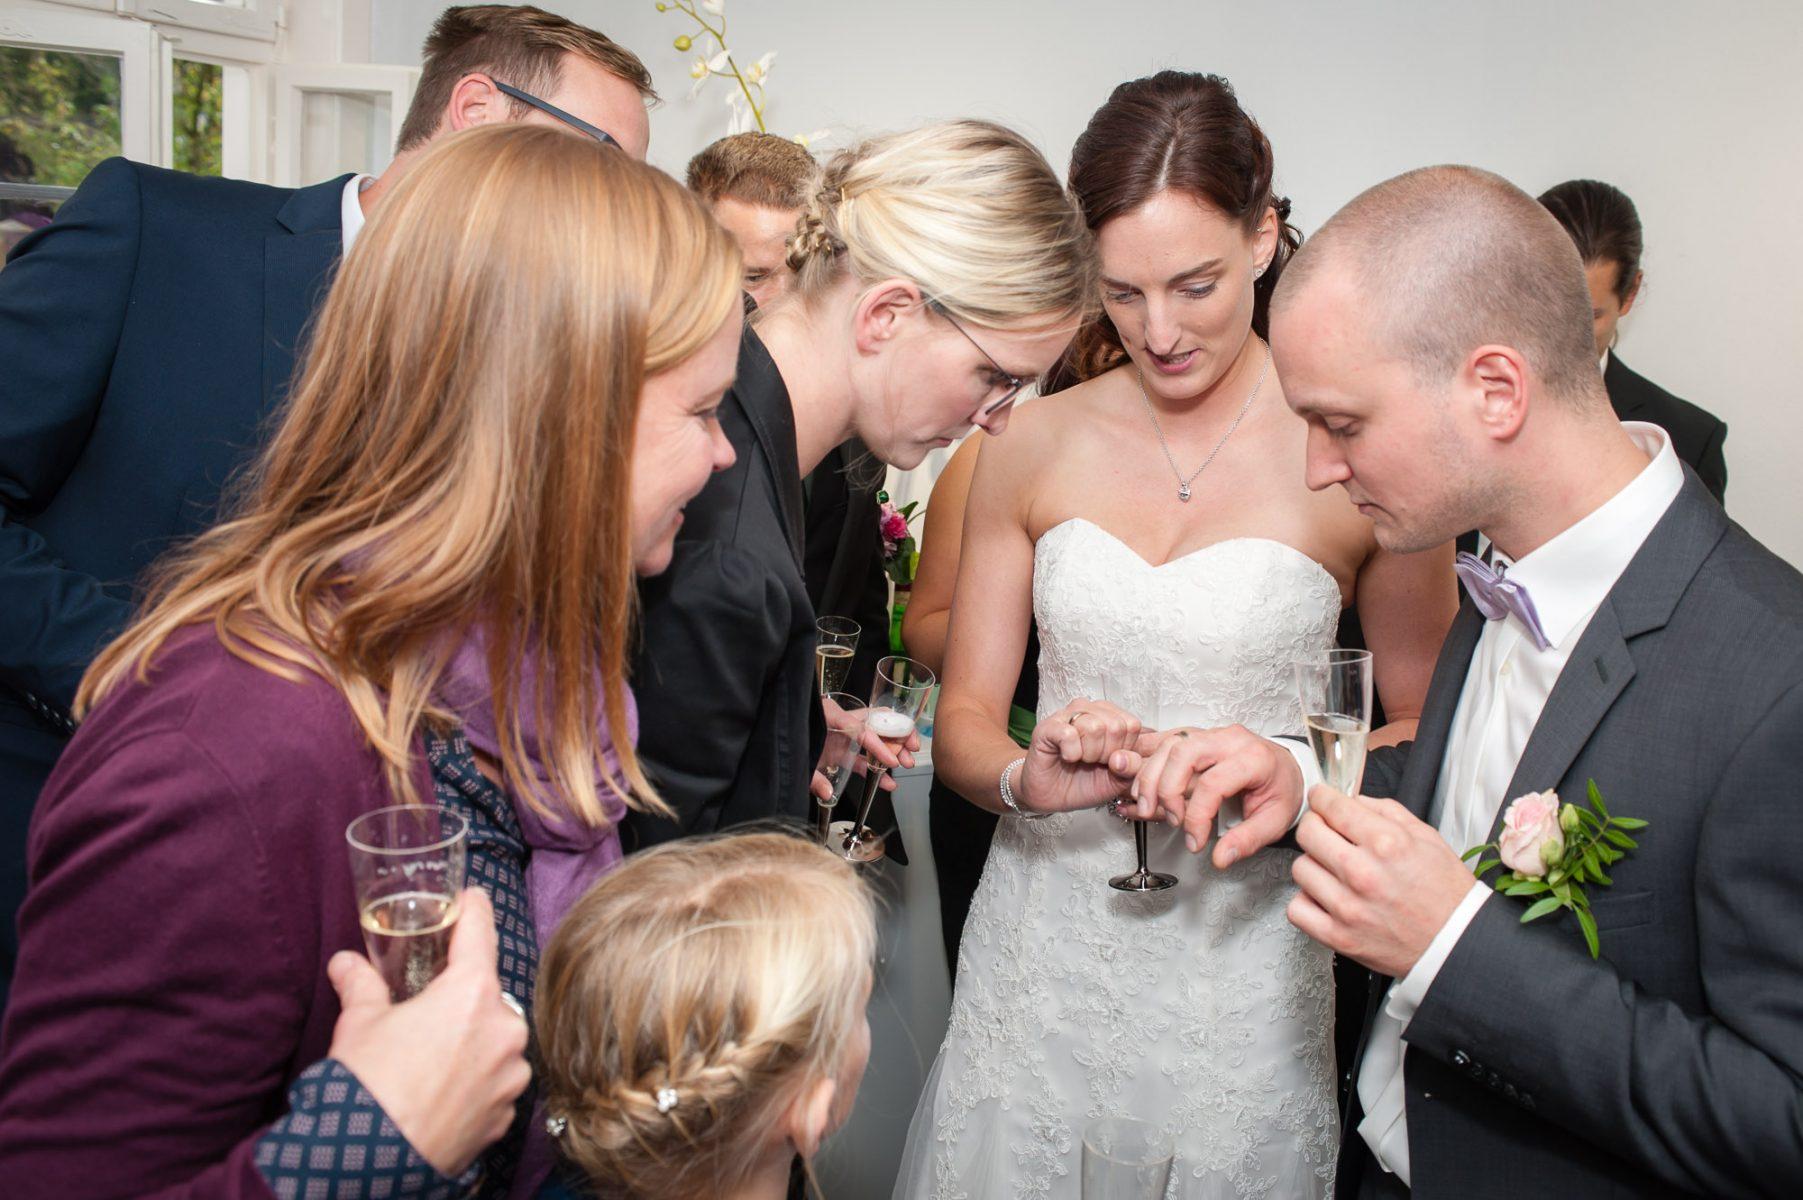 Hochzeit NadineKai 10 2017 B2000 226954 1803x1200 - FEIER